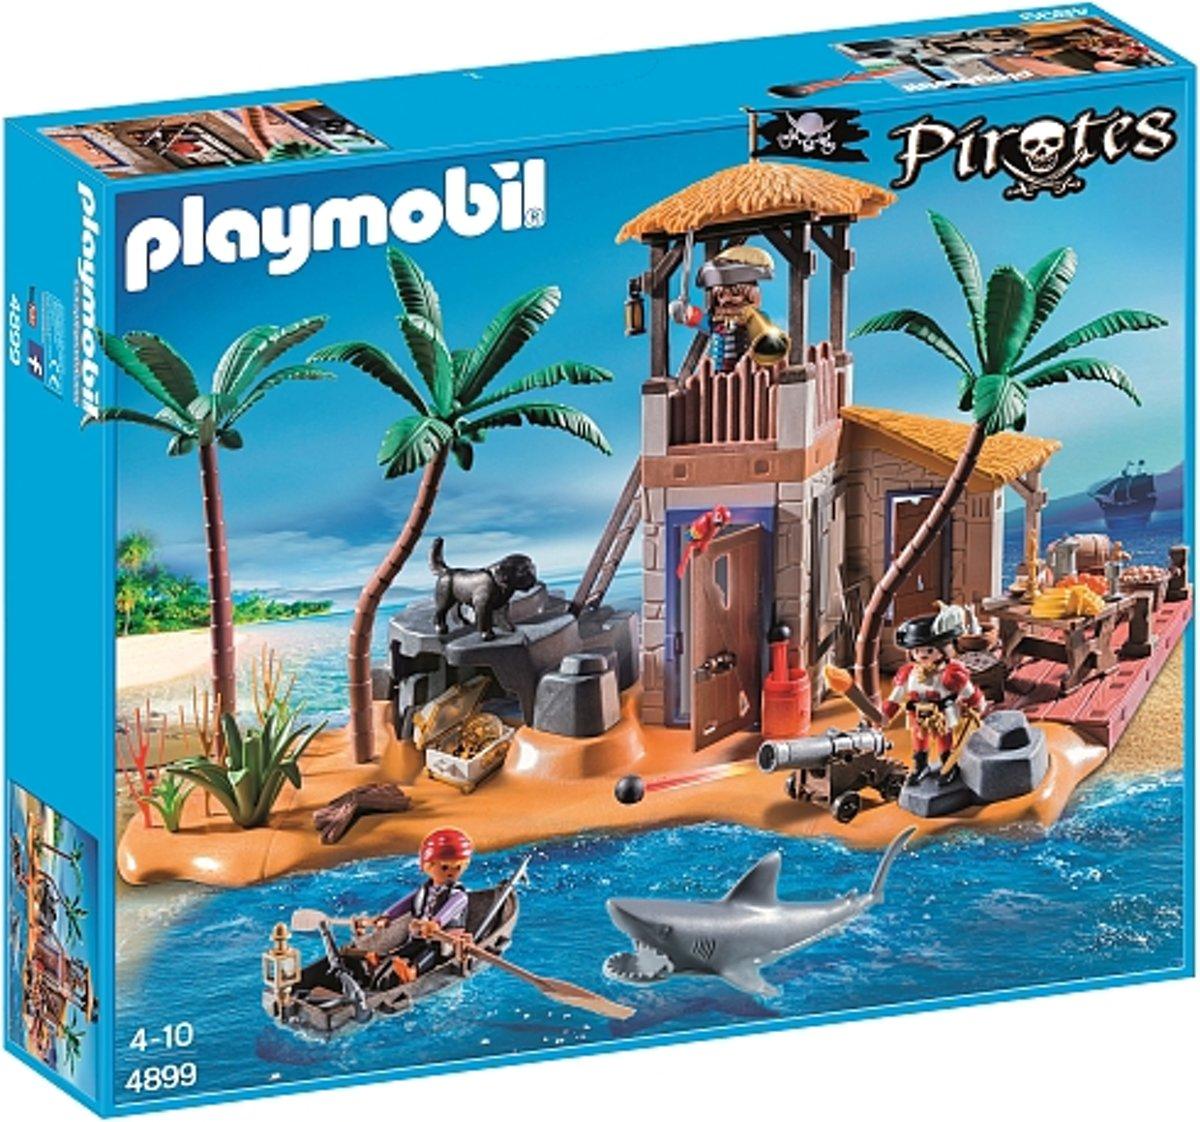 PLAYMOBIL Piratenbaai - 4899